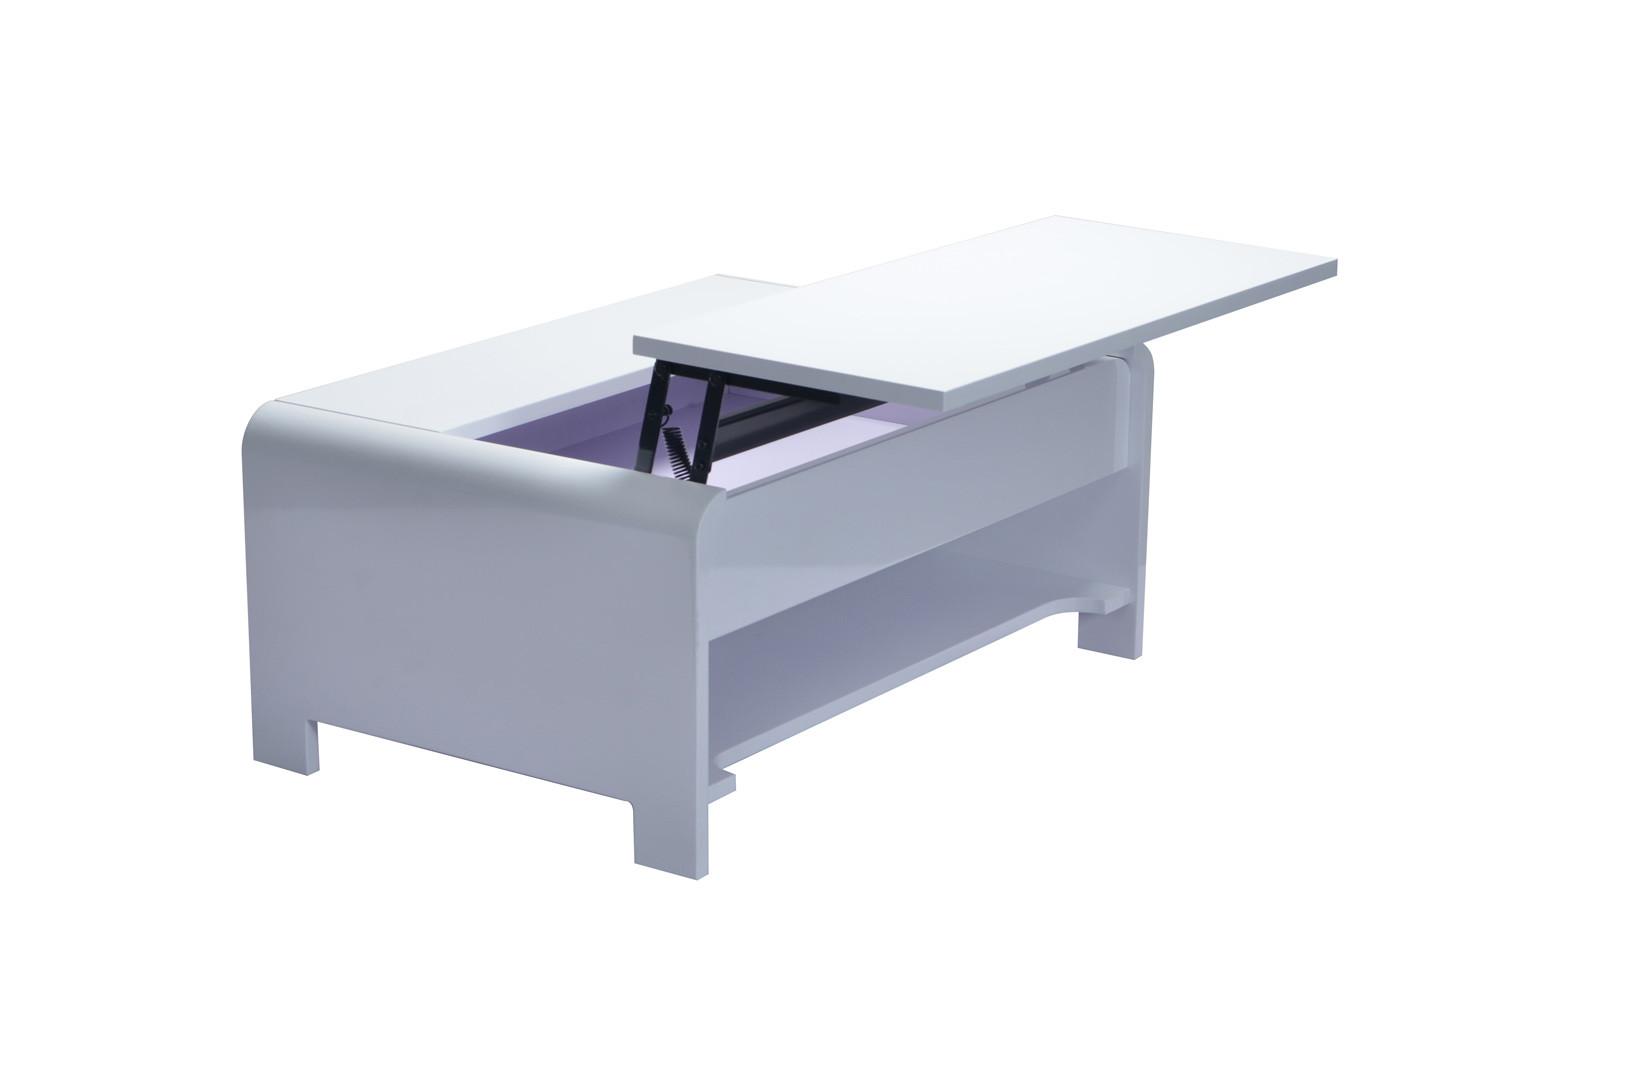 Table basse design laquée blanche Kevina